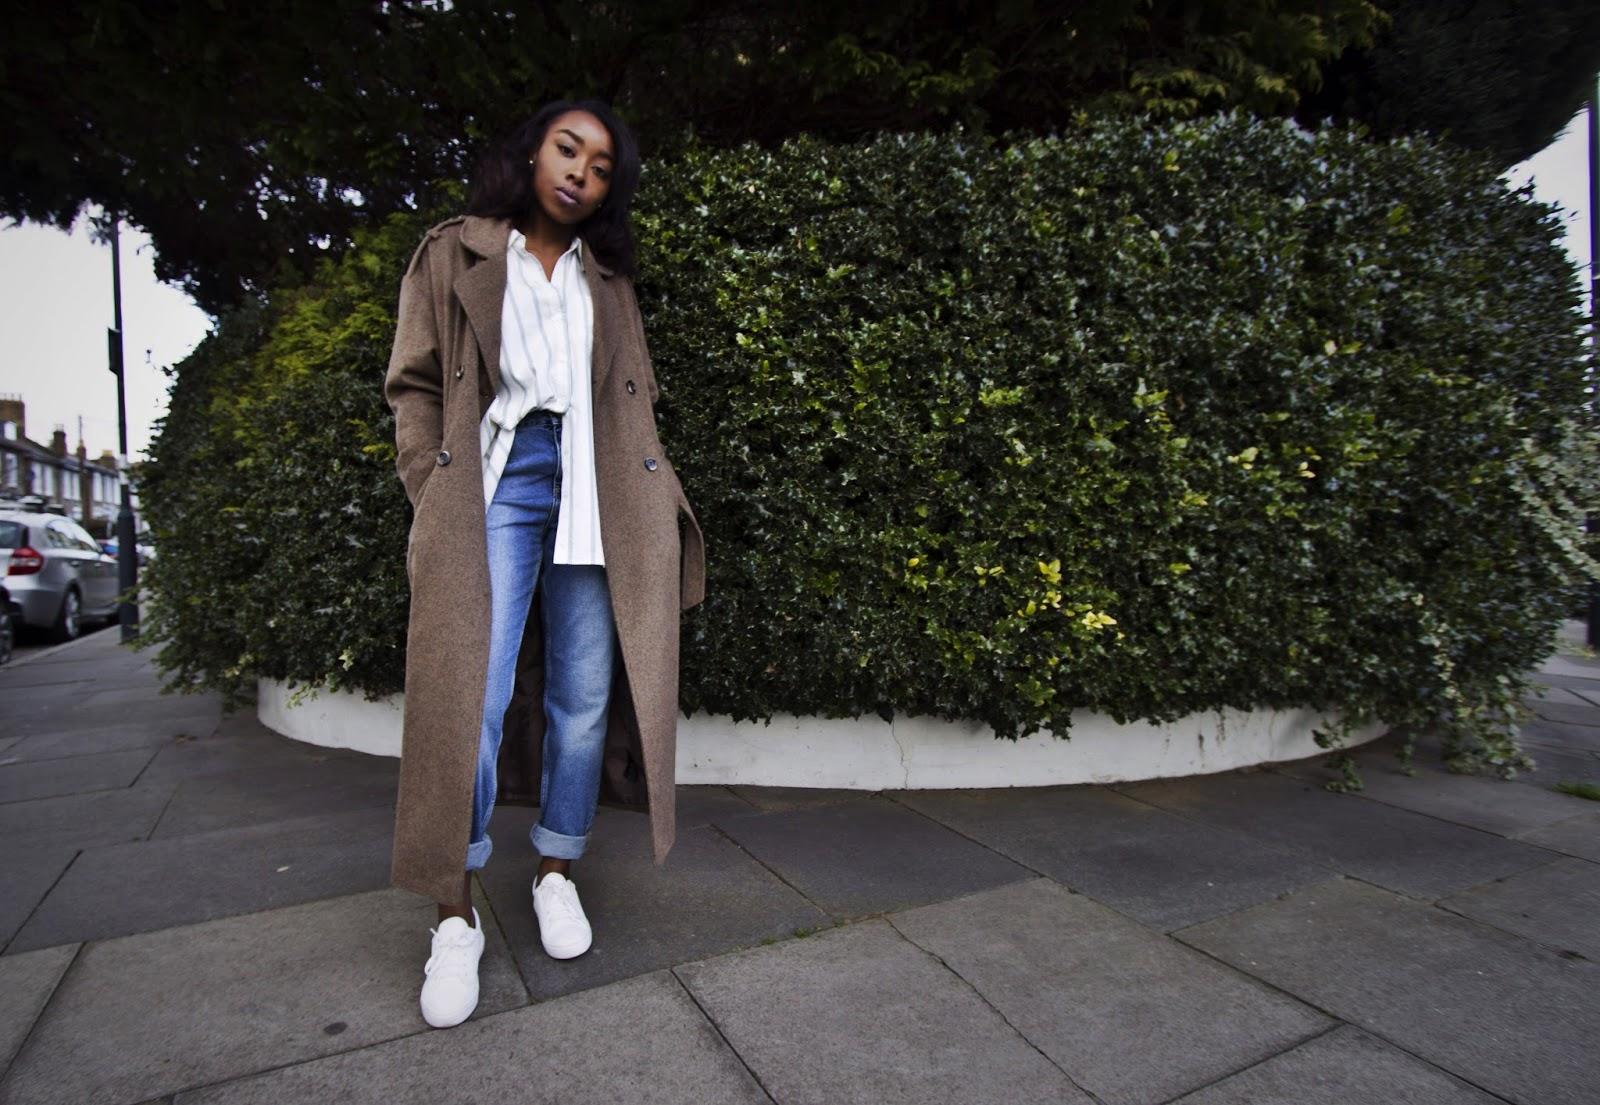 UK Fashion Blogger wearing Long Belted Over Sized Wool Coat